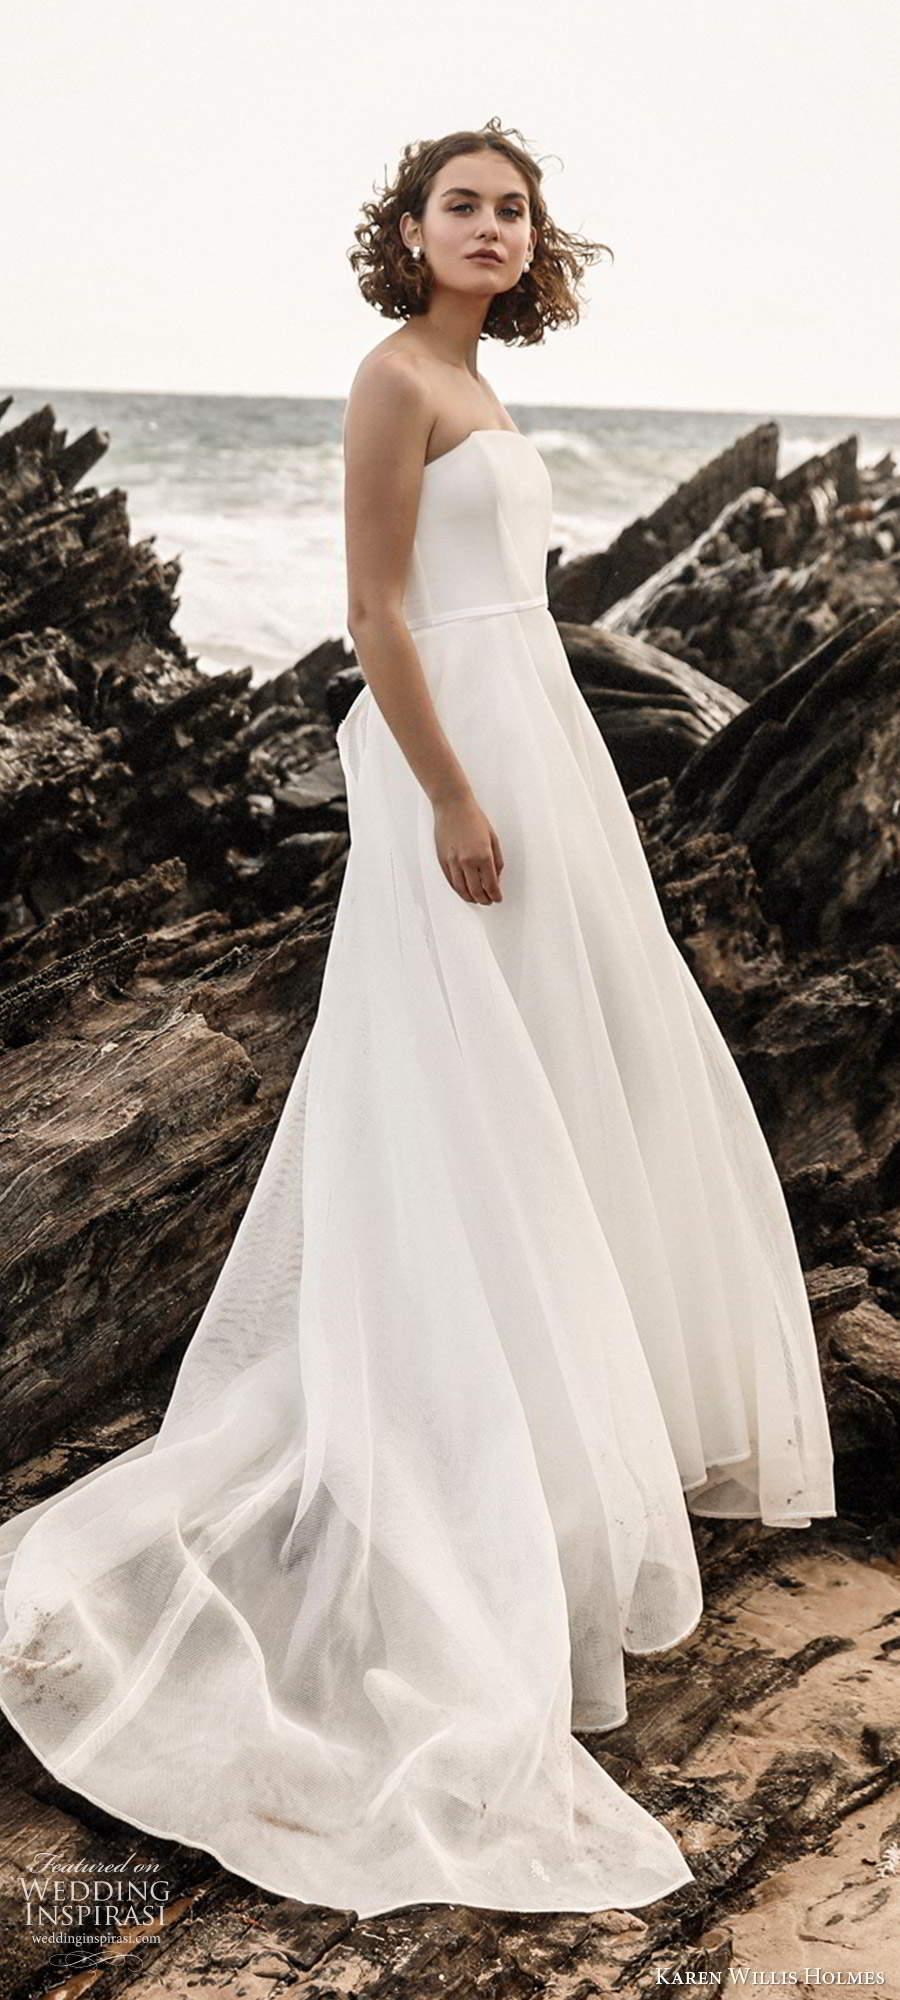 karen willis holmes 2020 bridal strapless straight across neckline clean minimally embellished a line ball gown wedding dress chapel train (2) sv